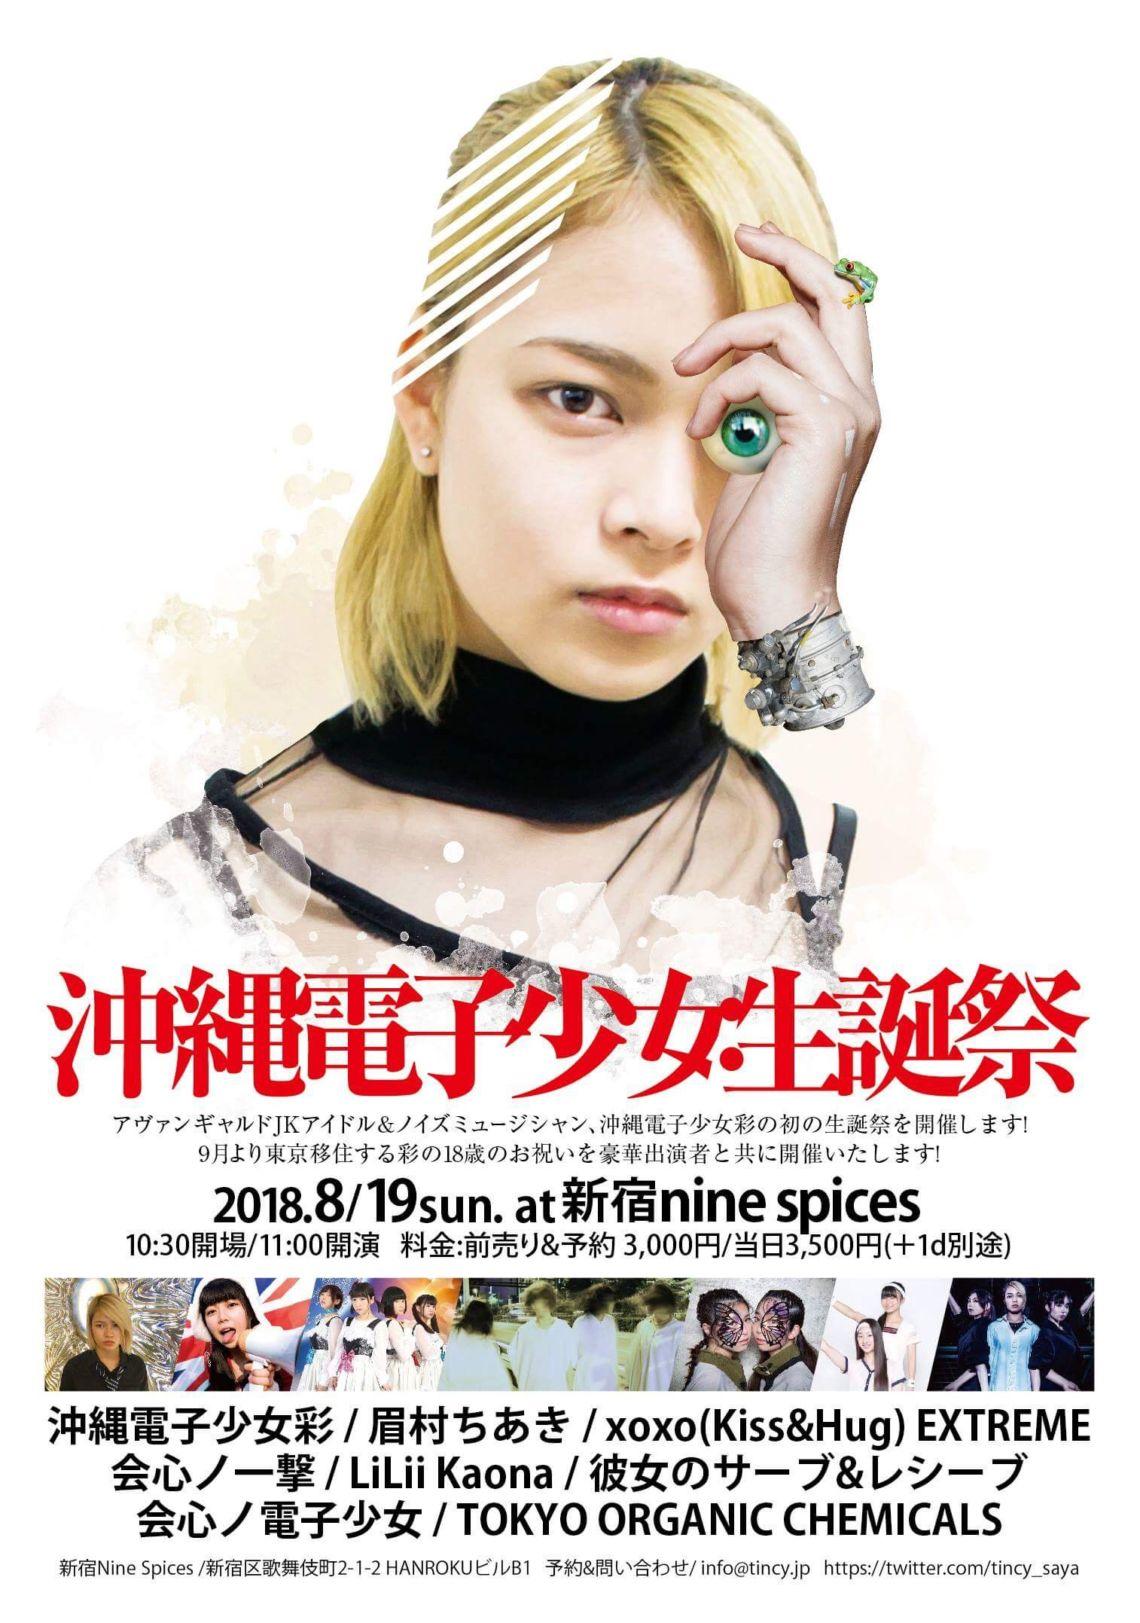 【DAYTIME EVENT】沖縄電子少女彩 生誕祭